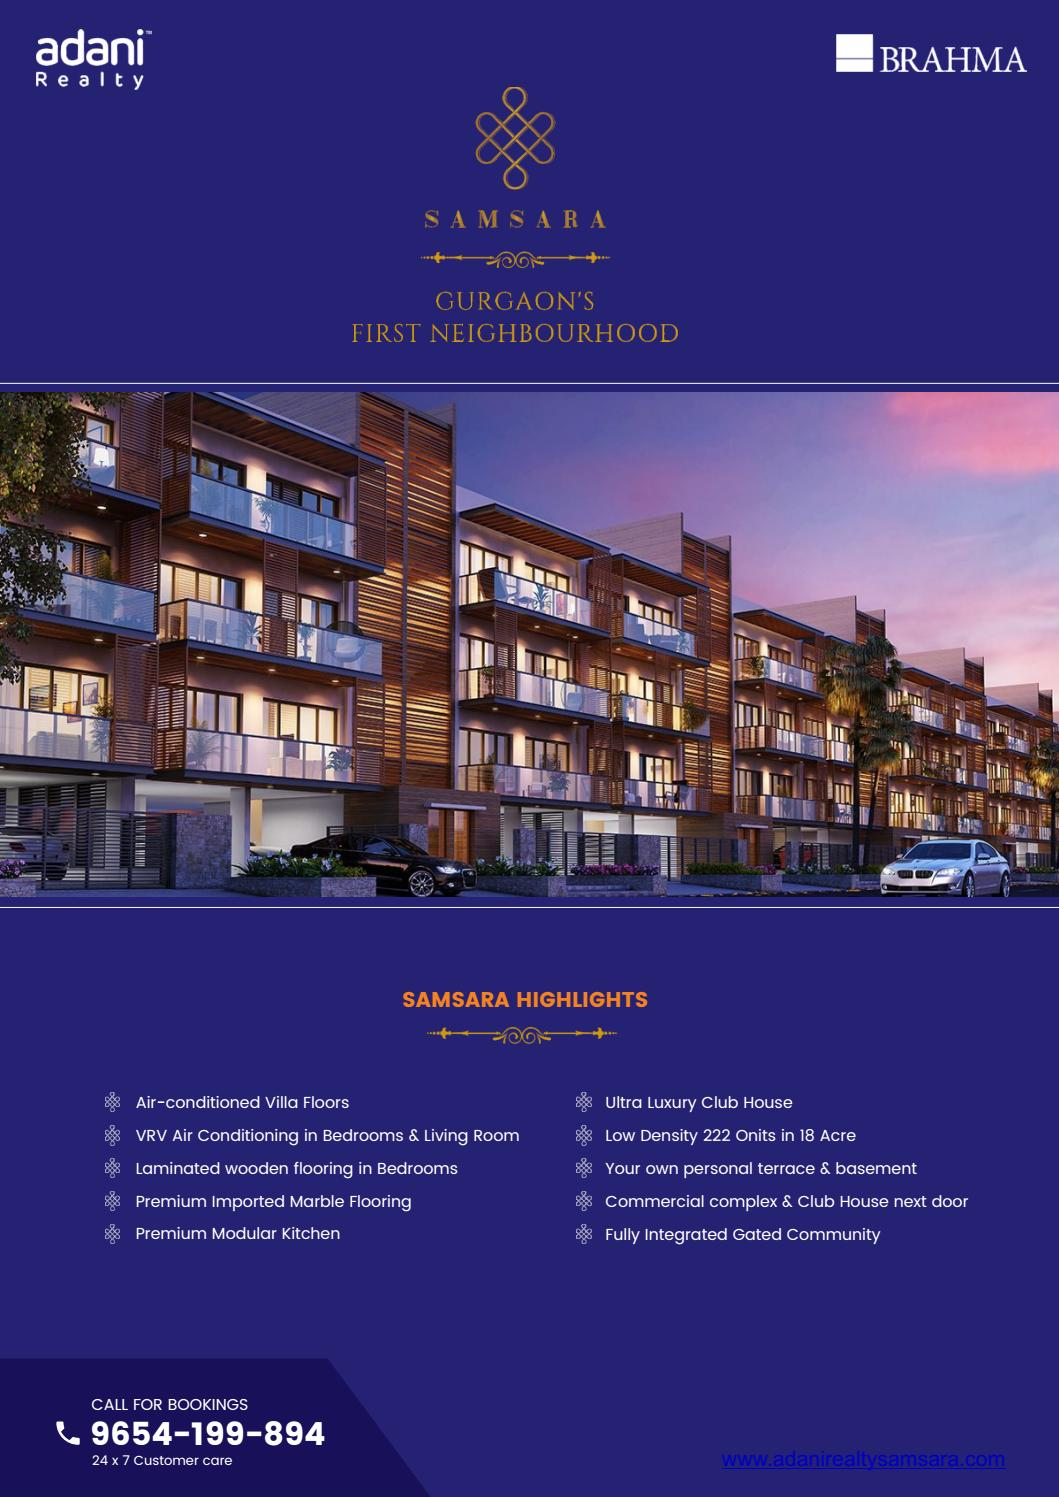 Adani Samsara Brochure Layouts Floor Plans Location Features By Property Issuu